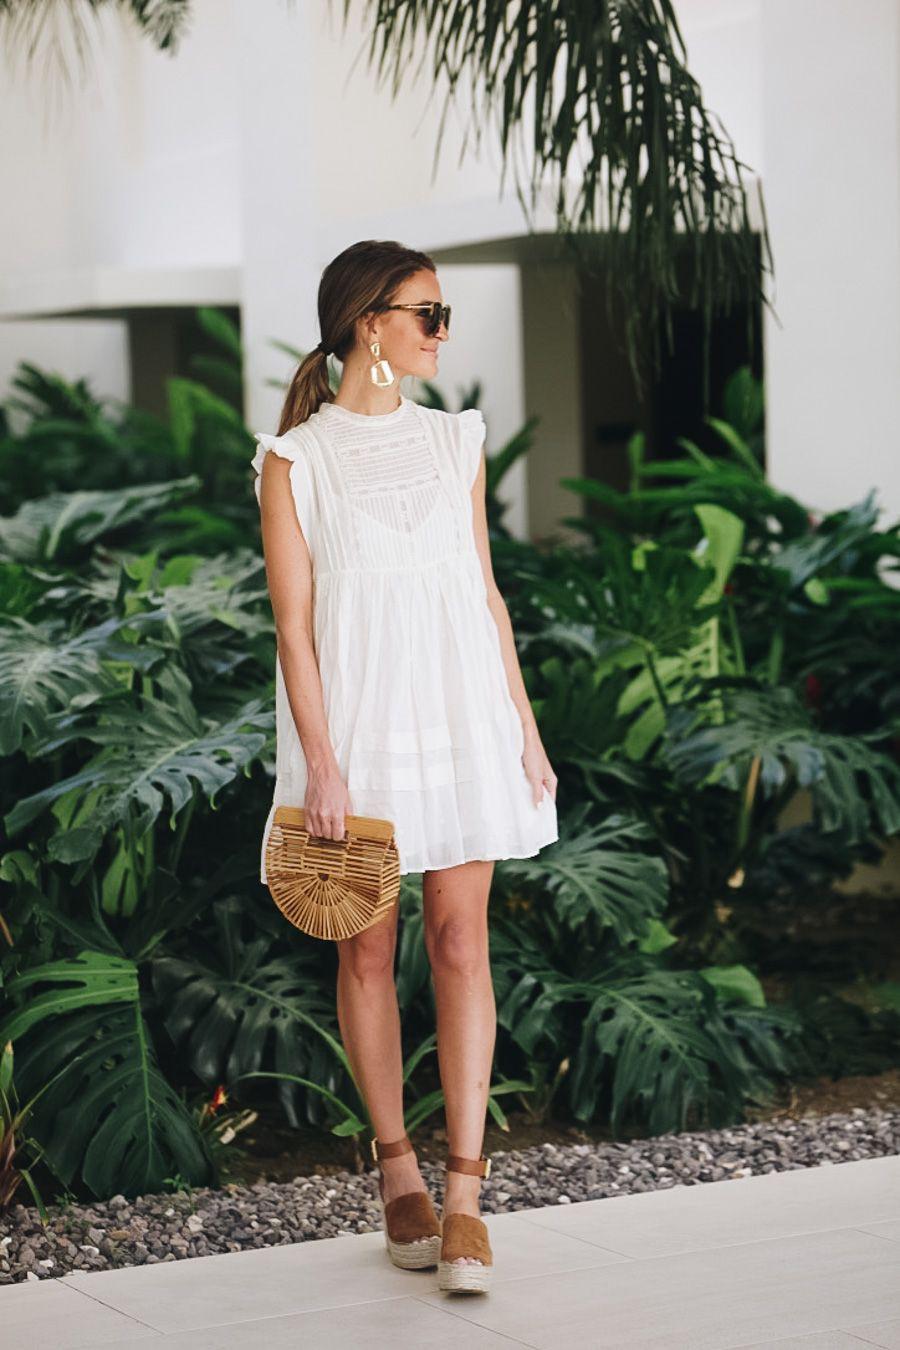 Little white dress outfit, cocktail dress, wedding dress, fashion model